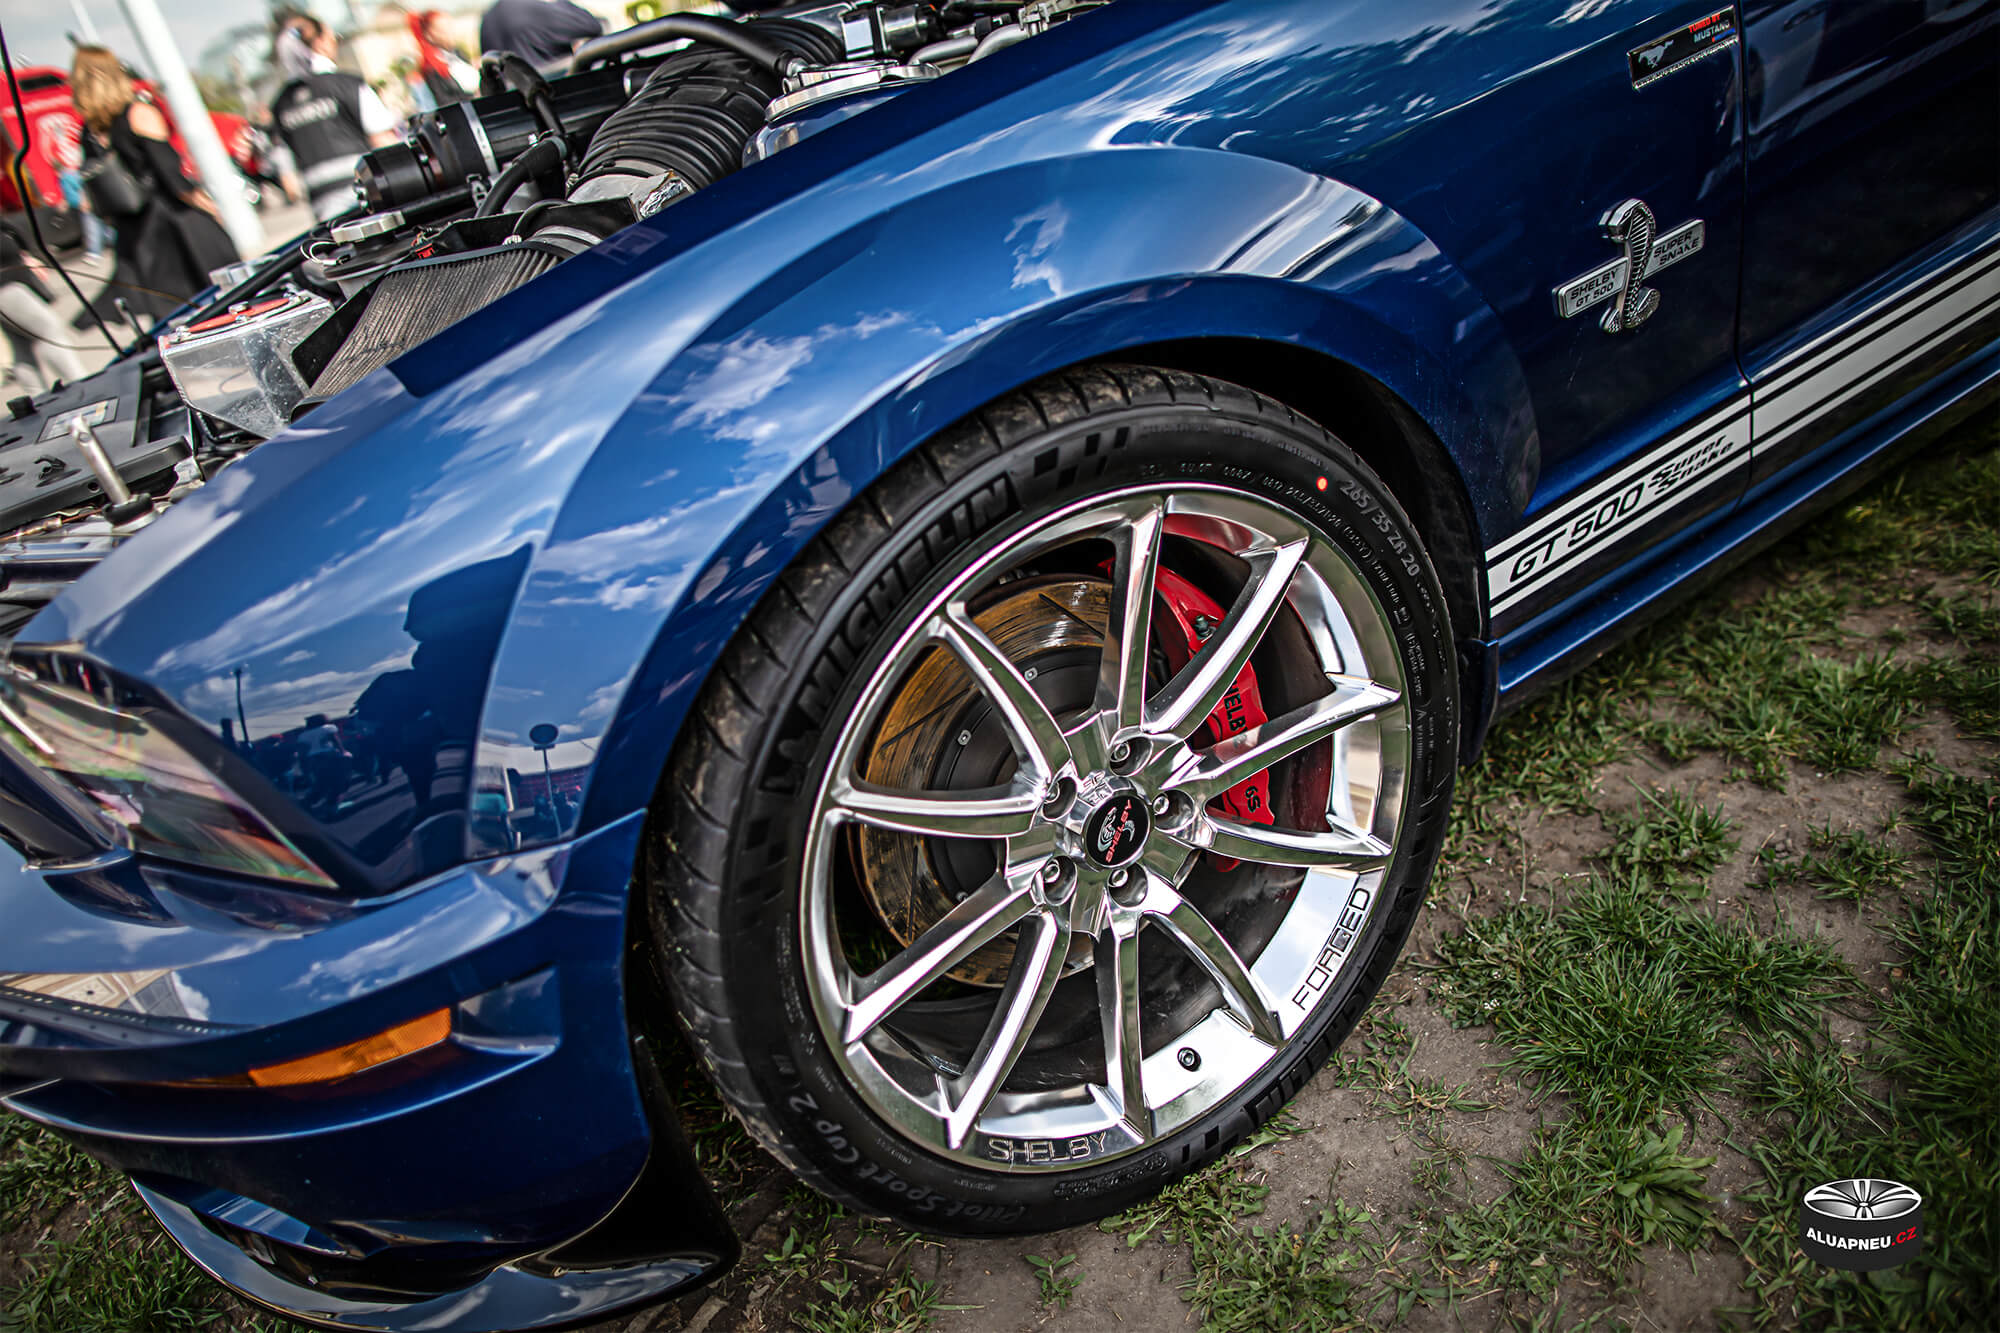 Chromované elektrony Ford Mustang Shelby - Originální chrom alu kola - Automobilové Legendy 2019 - www.aluapneu.cz